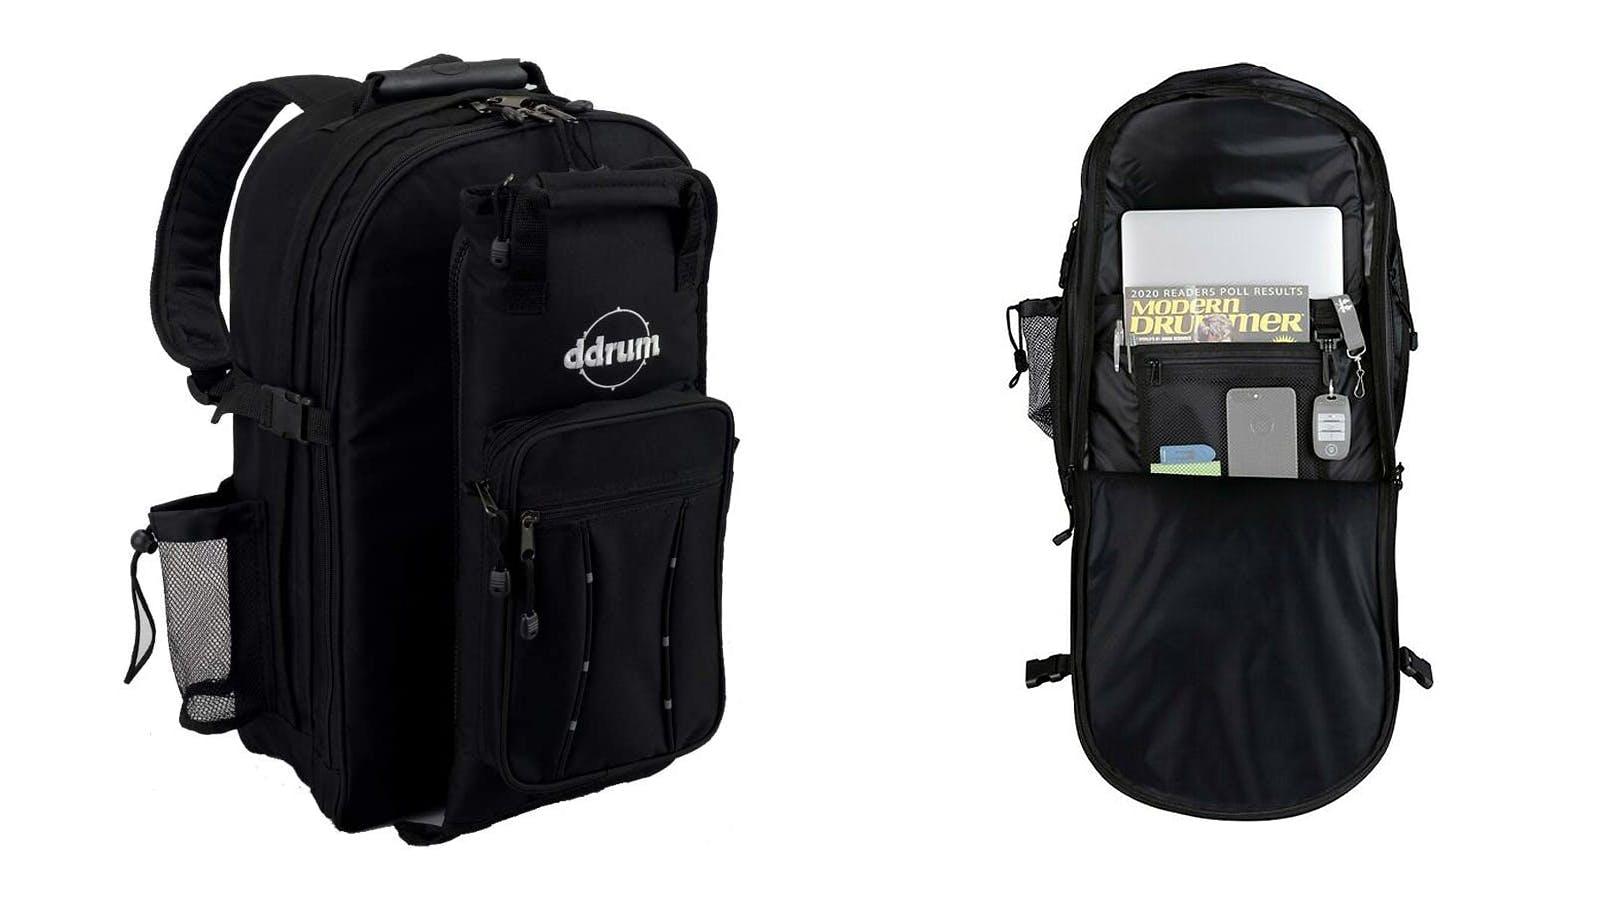 ddrum StickPack Backpack